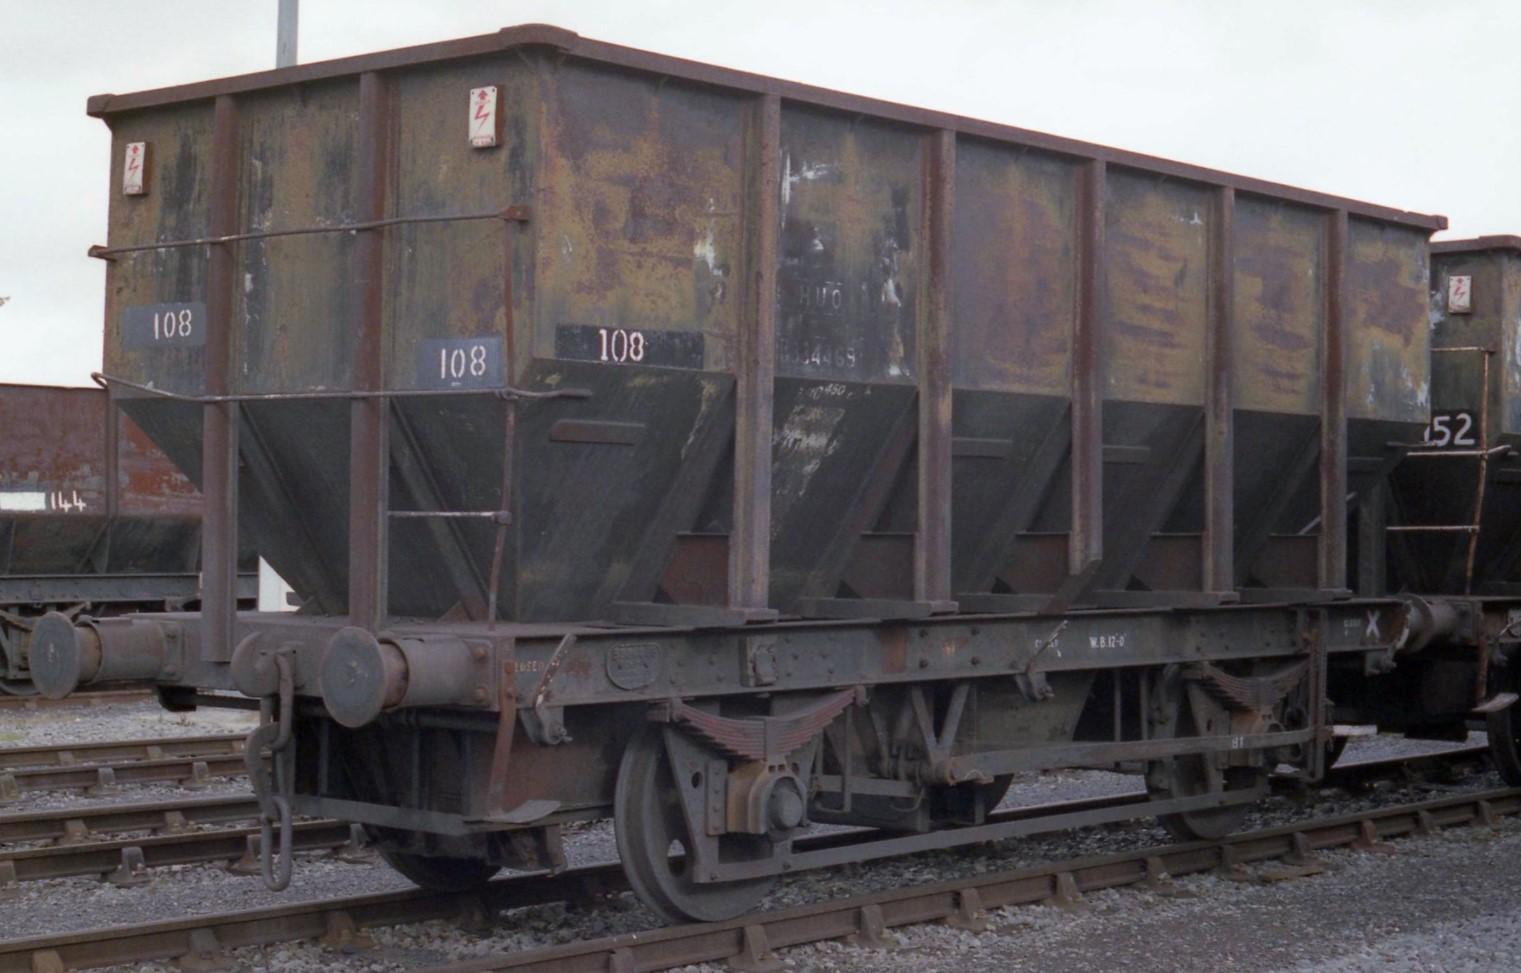 B334469 at Onllwyn in October 1992. ©Jamerail